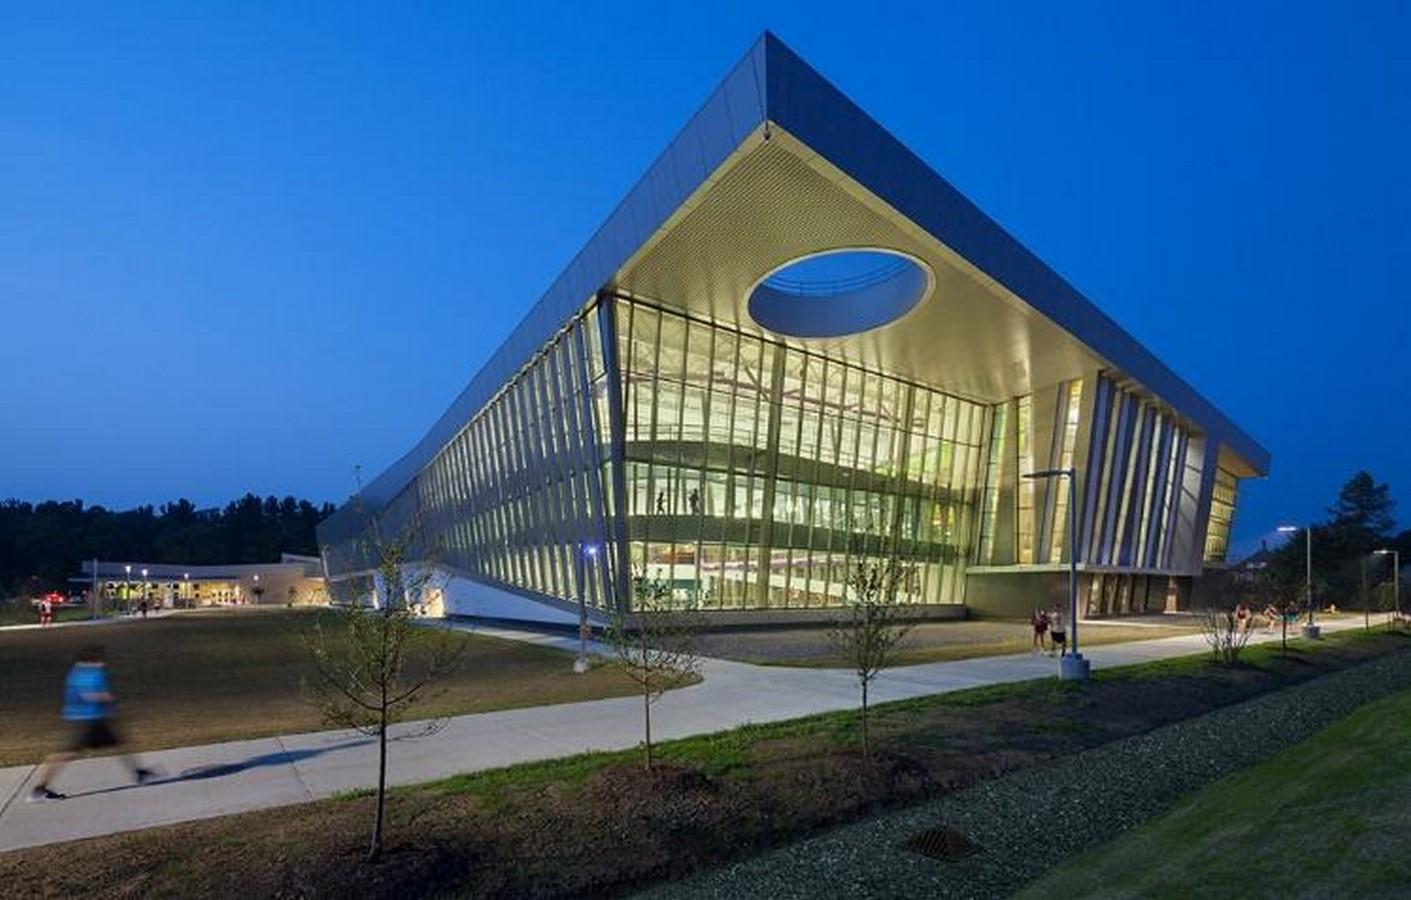 Student Life center-state University of New York (SUNY) Cortland- sheet1